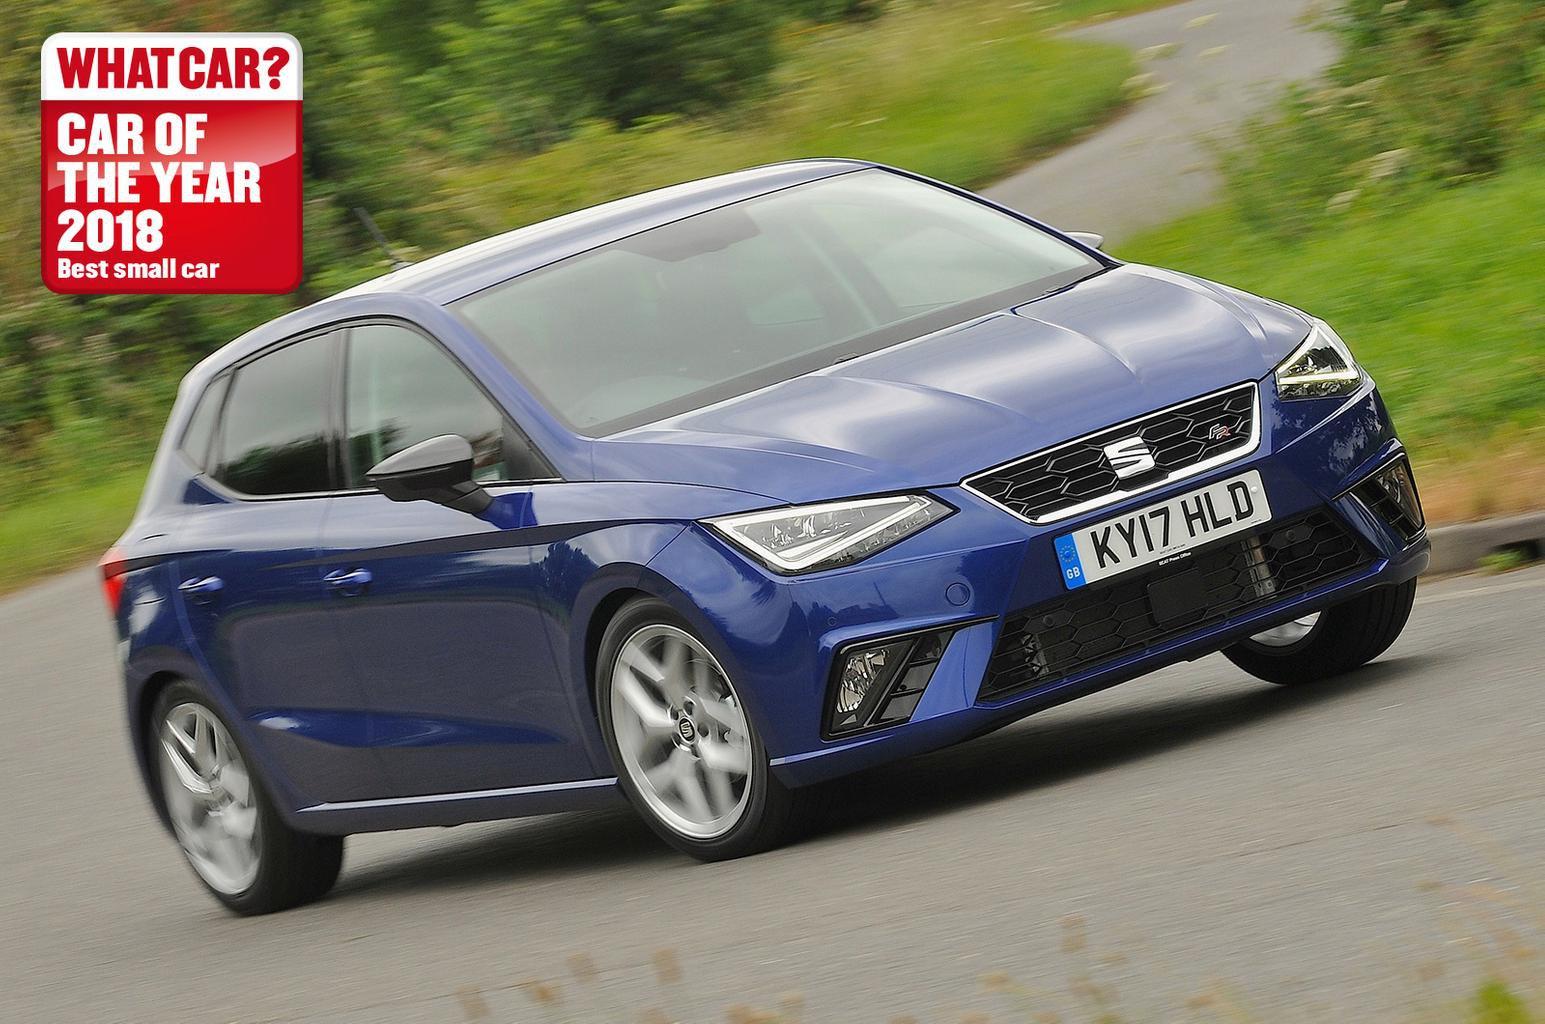 Best car deals for less than £200 per month